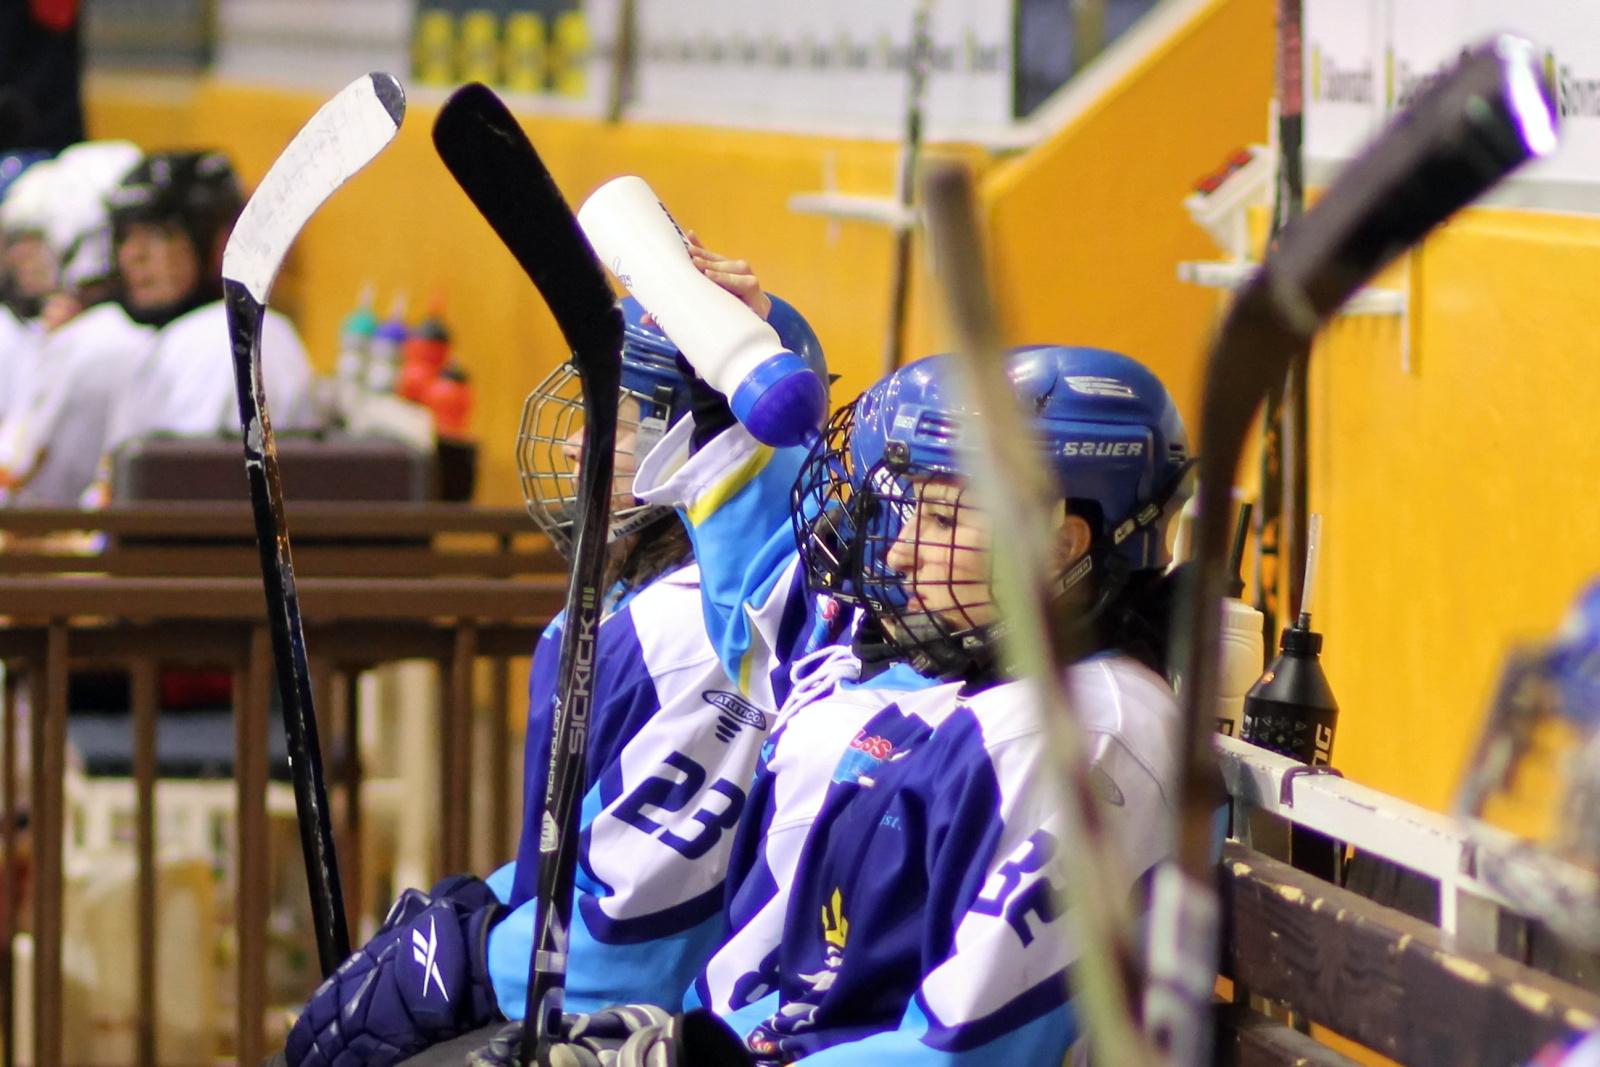 zhkm-zvolen-martin-hokej-2011-20